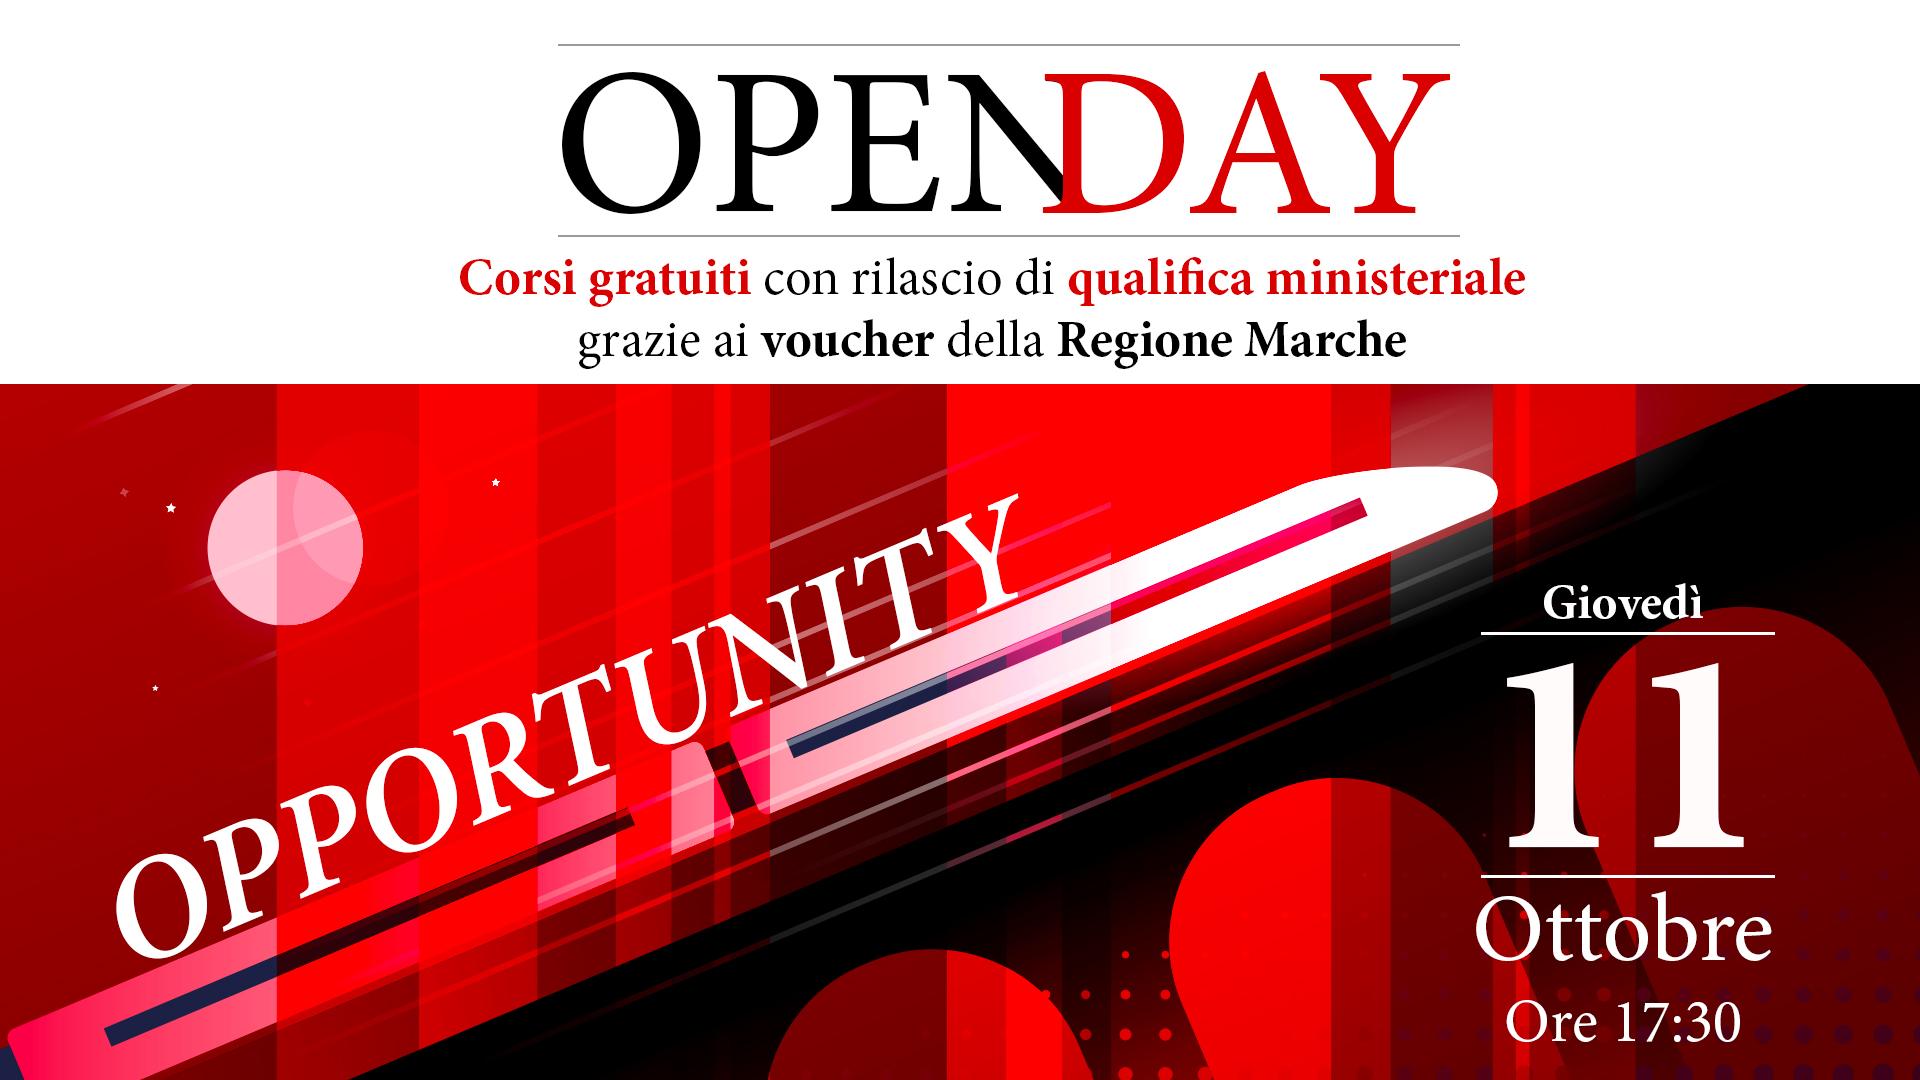 Open Day Istituto ROI